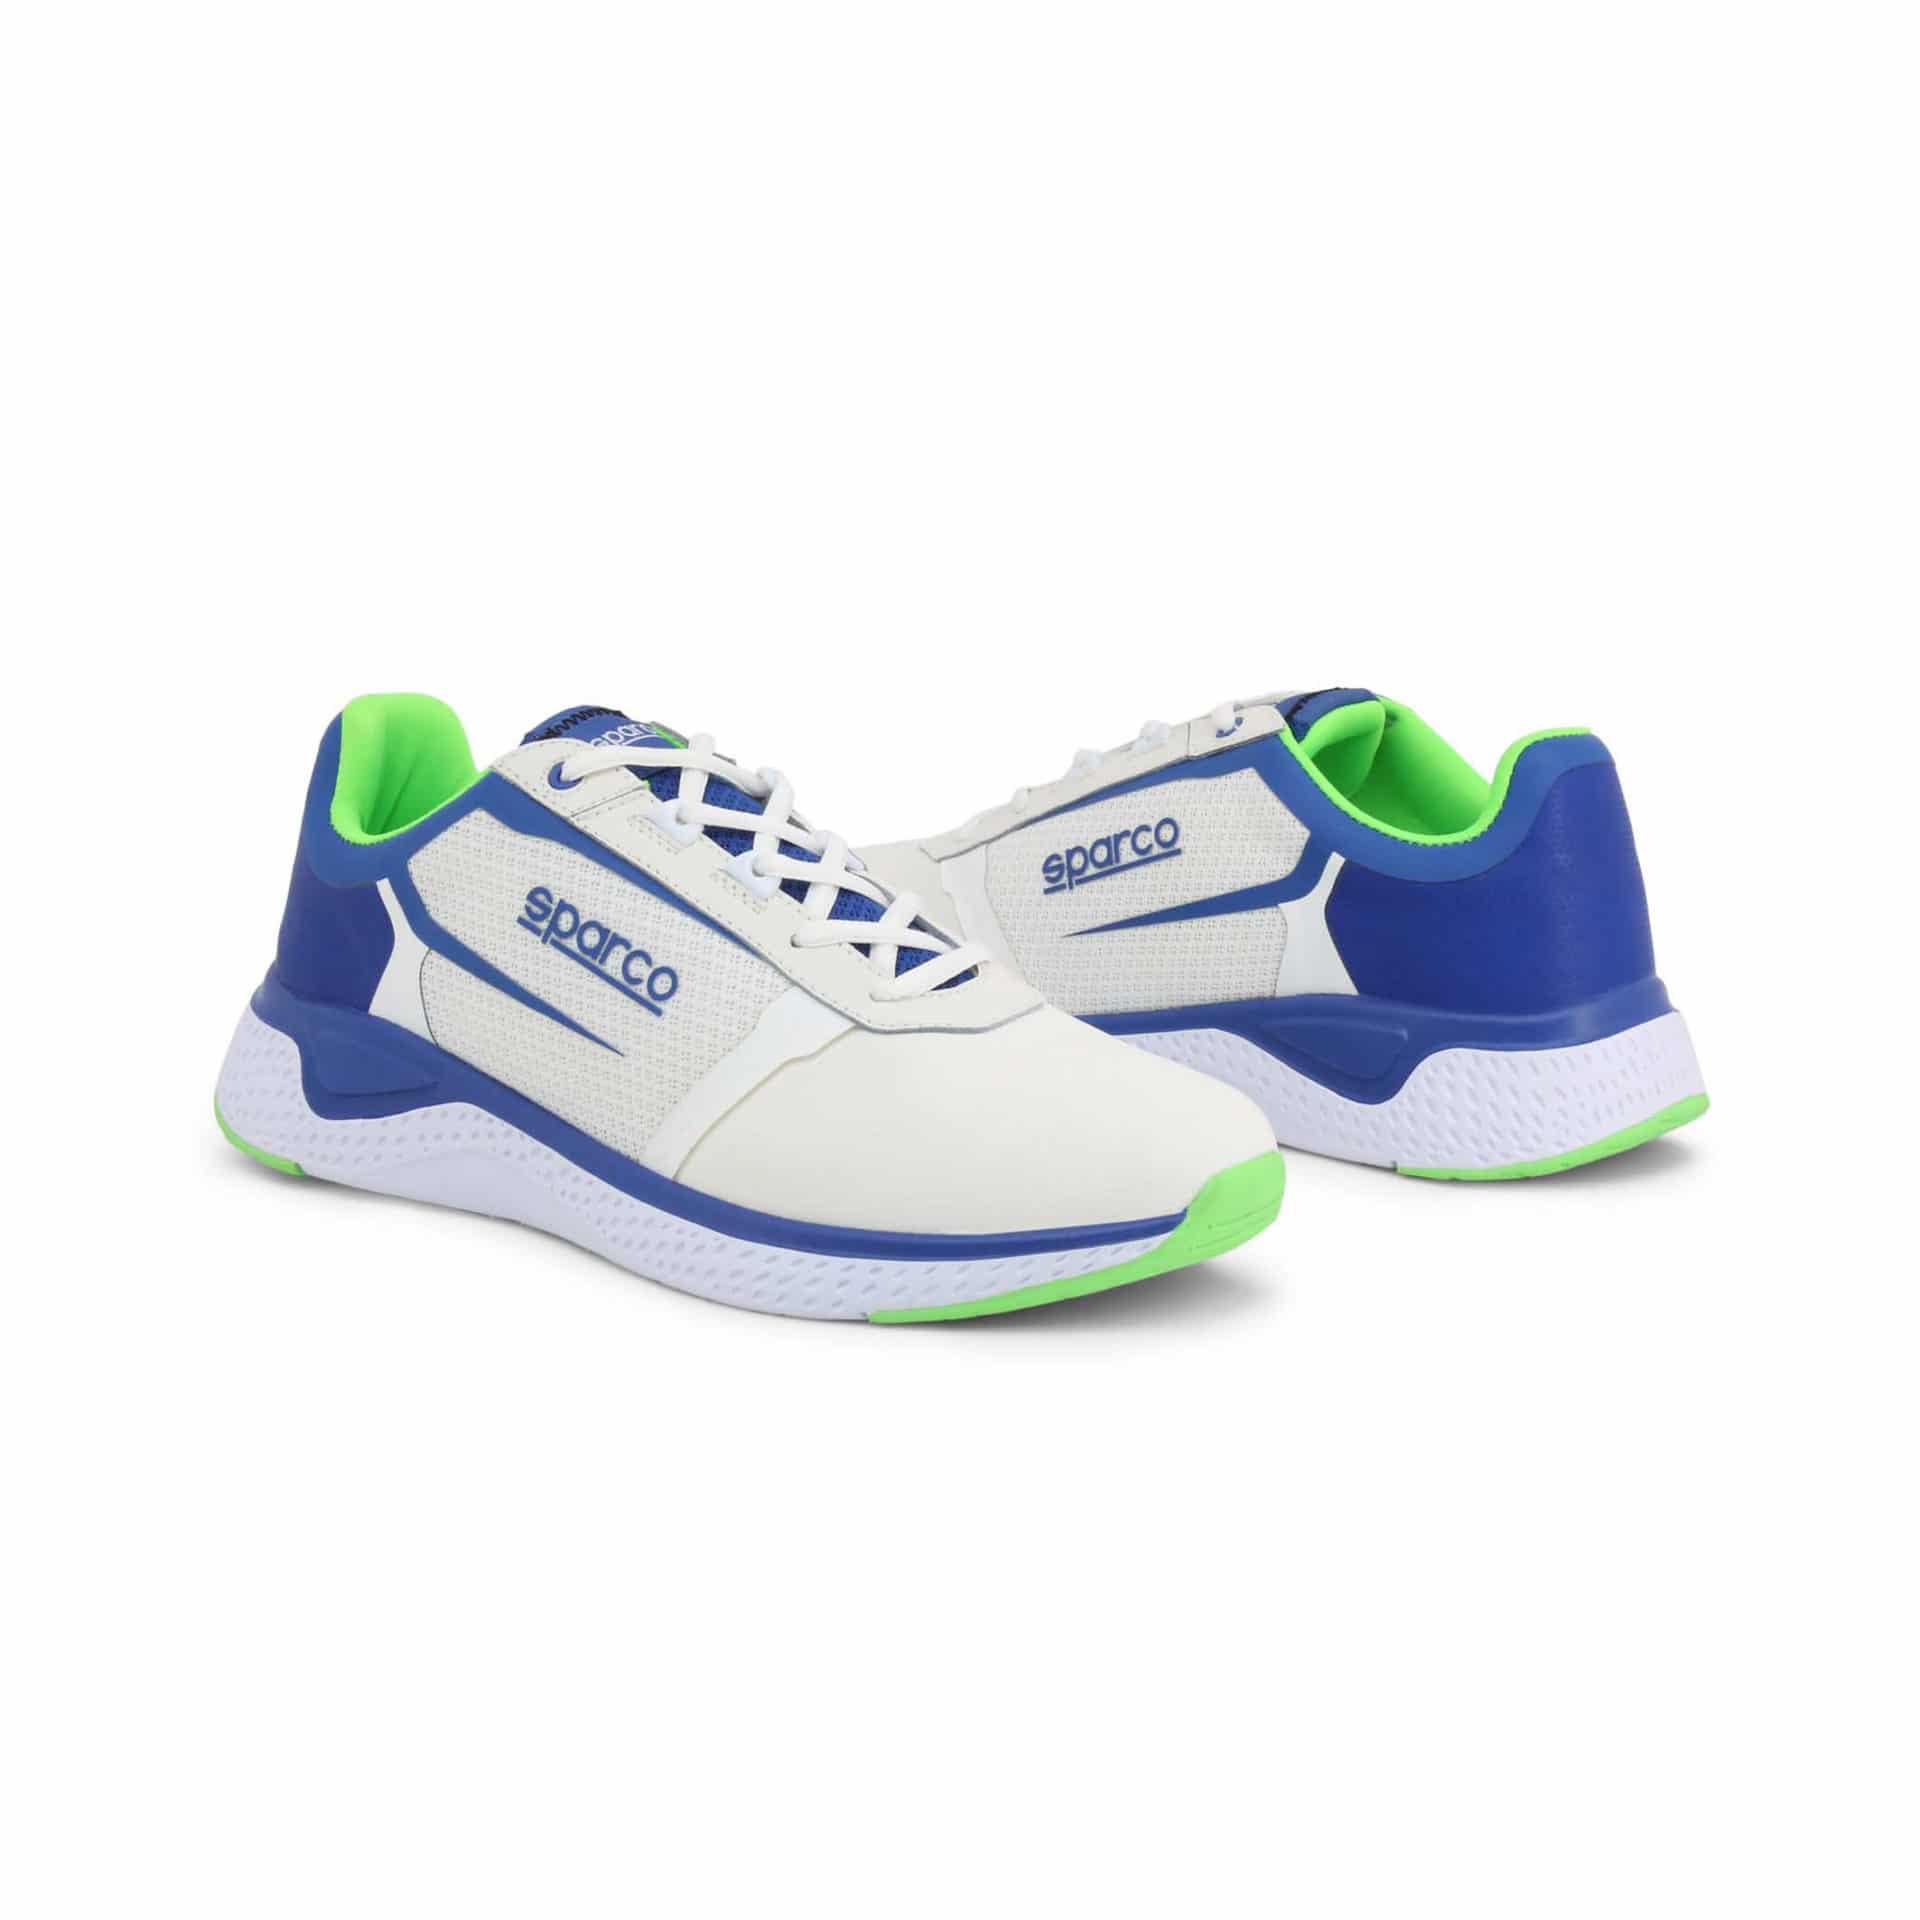 Chaussures Sparco SP-FV - blanc (du 40 au 47) - SparcoFashion.fr